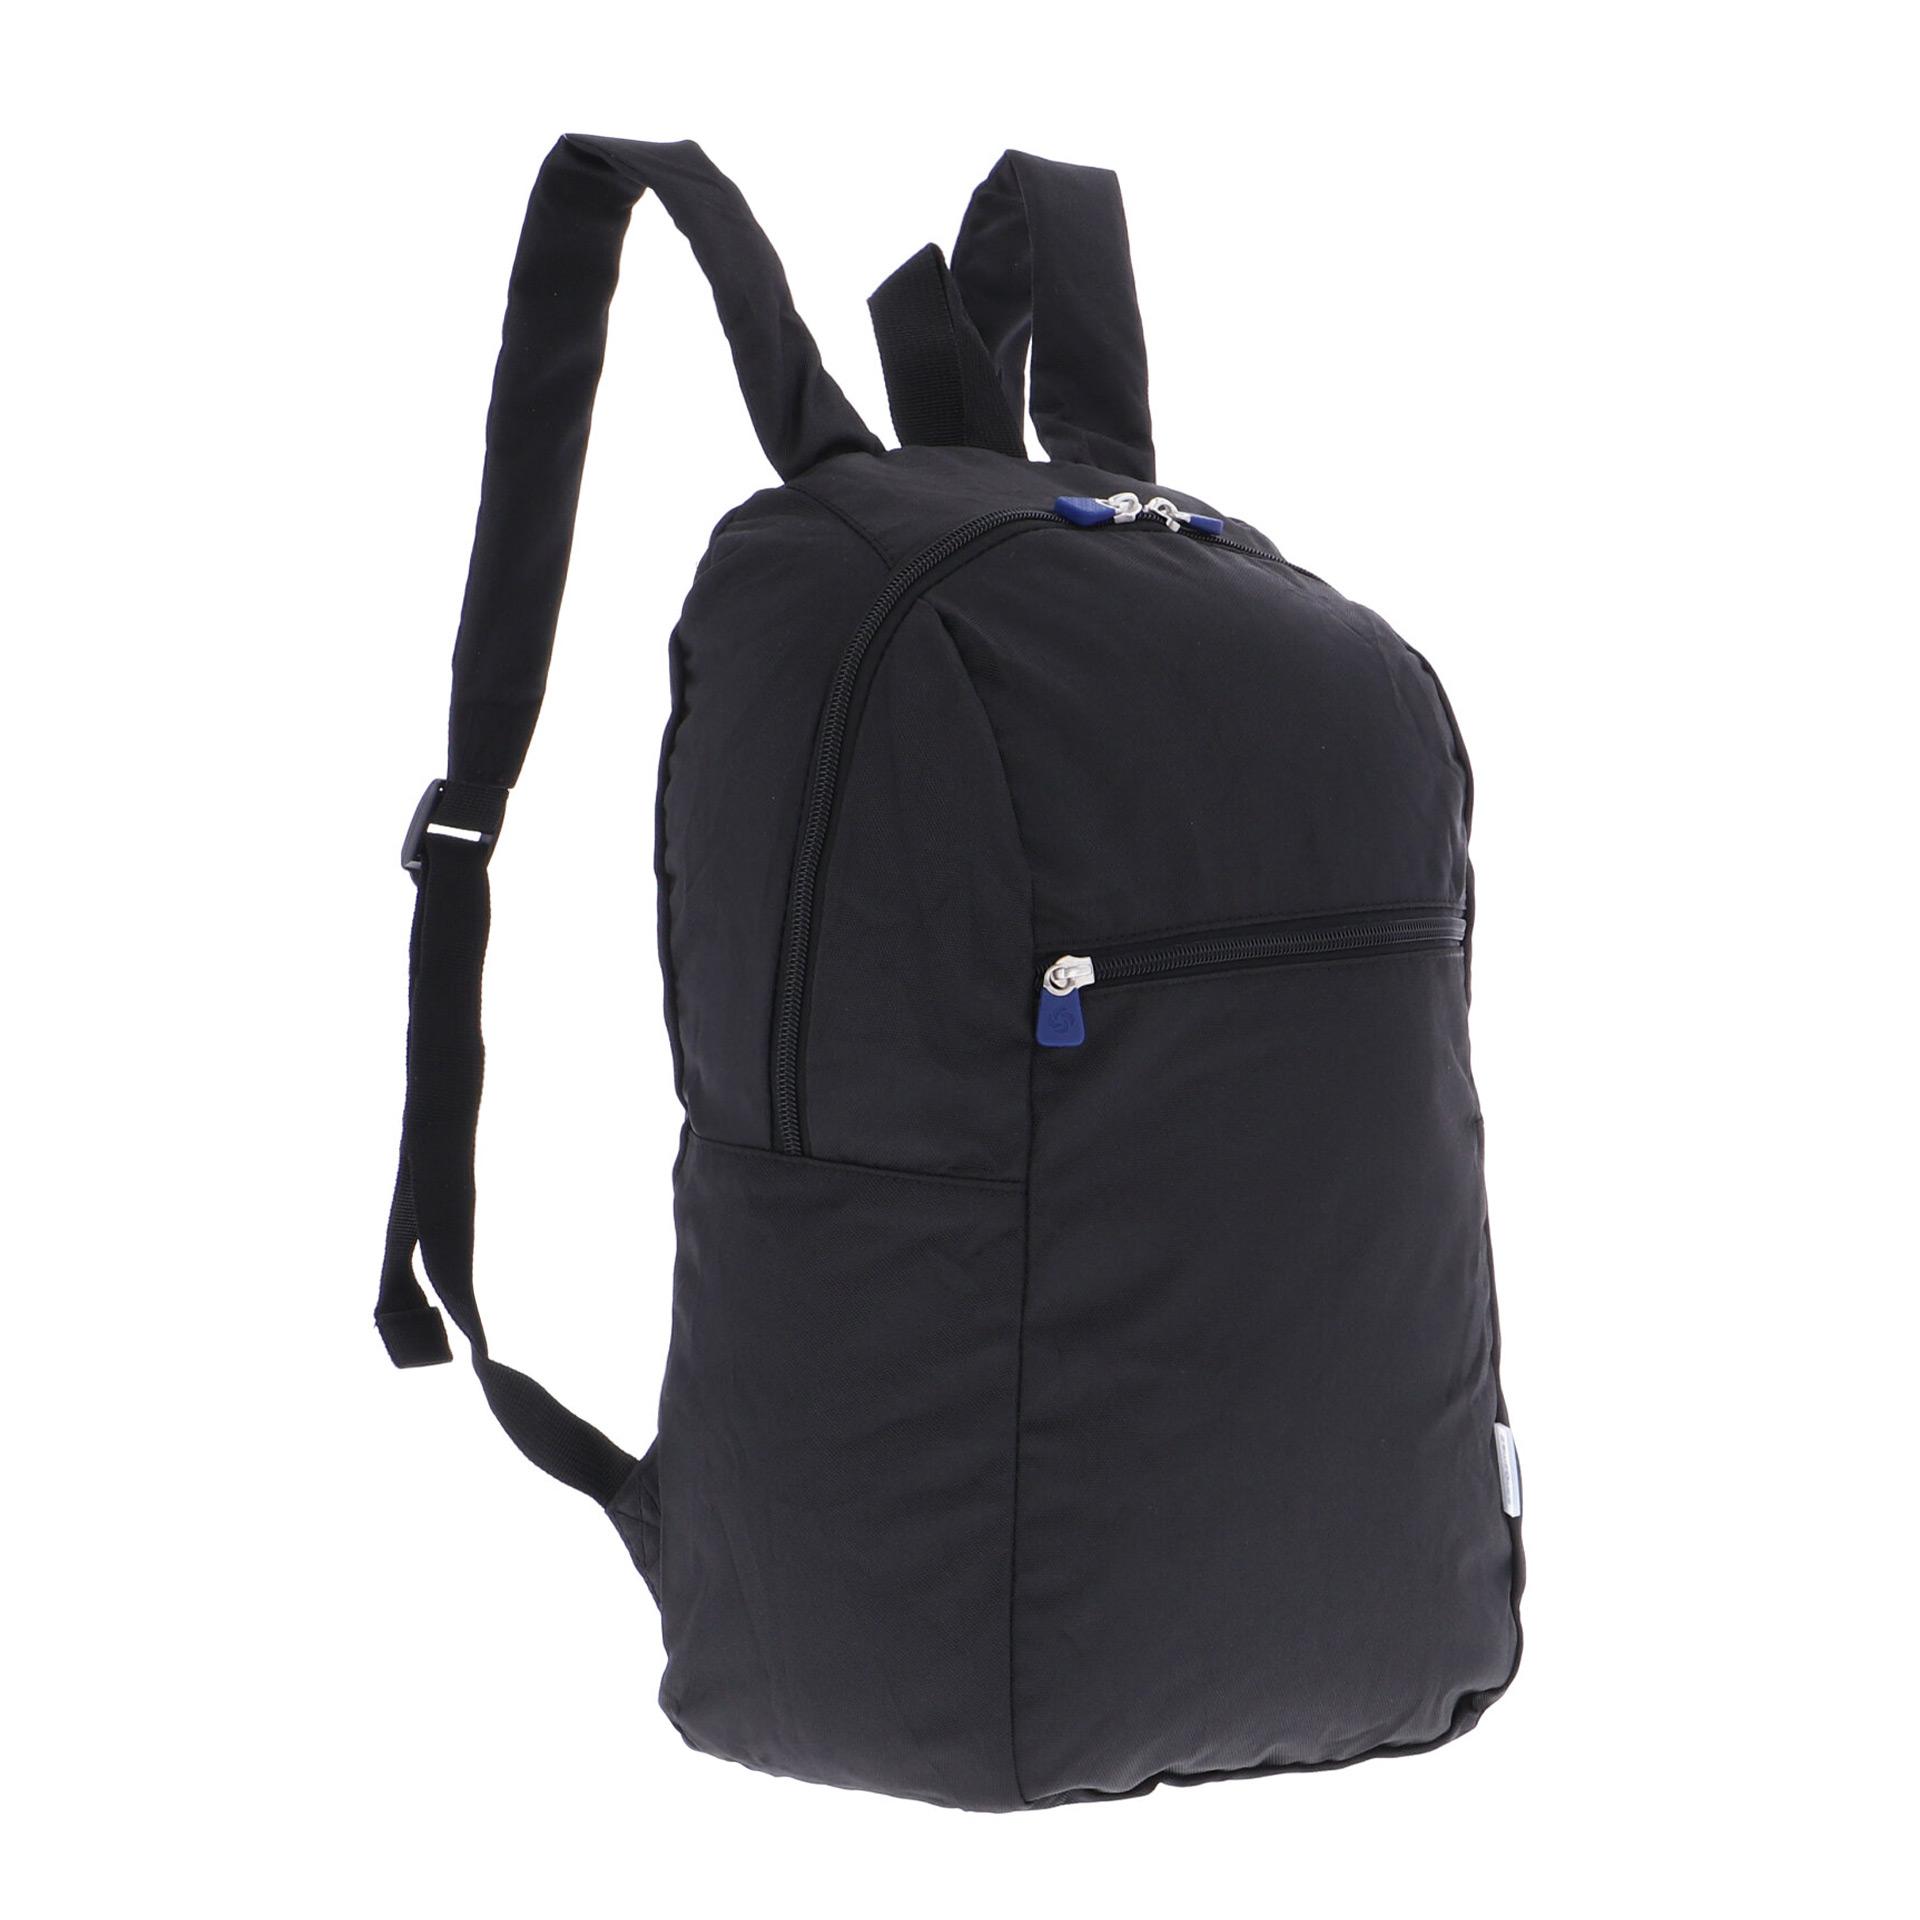 Global Travel Accessories Rucksack black